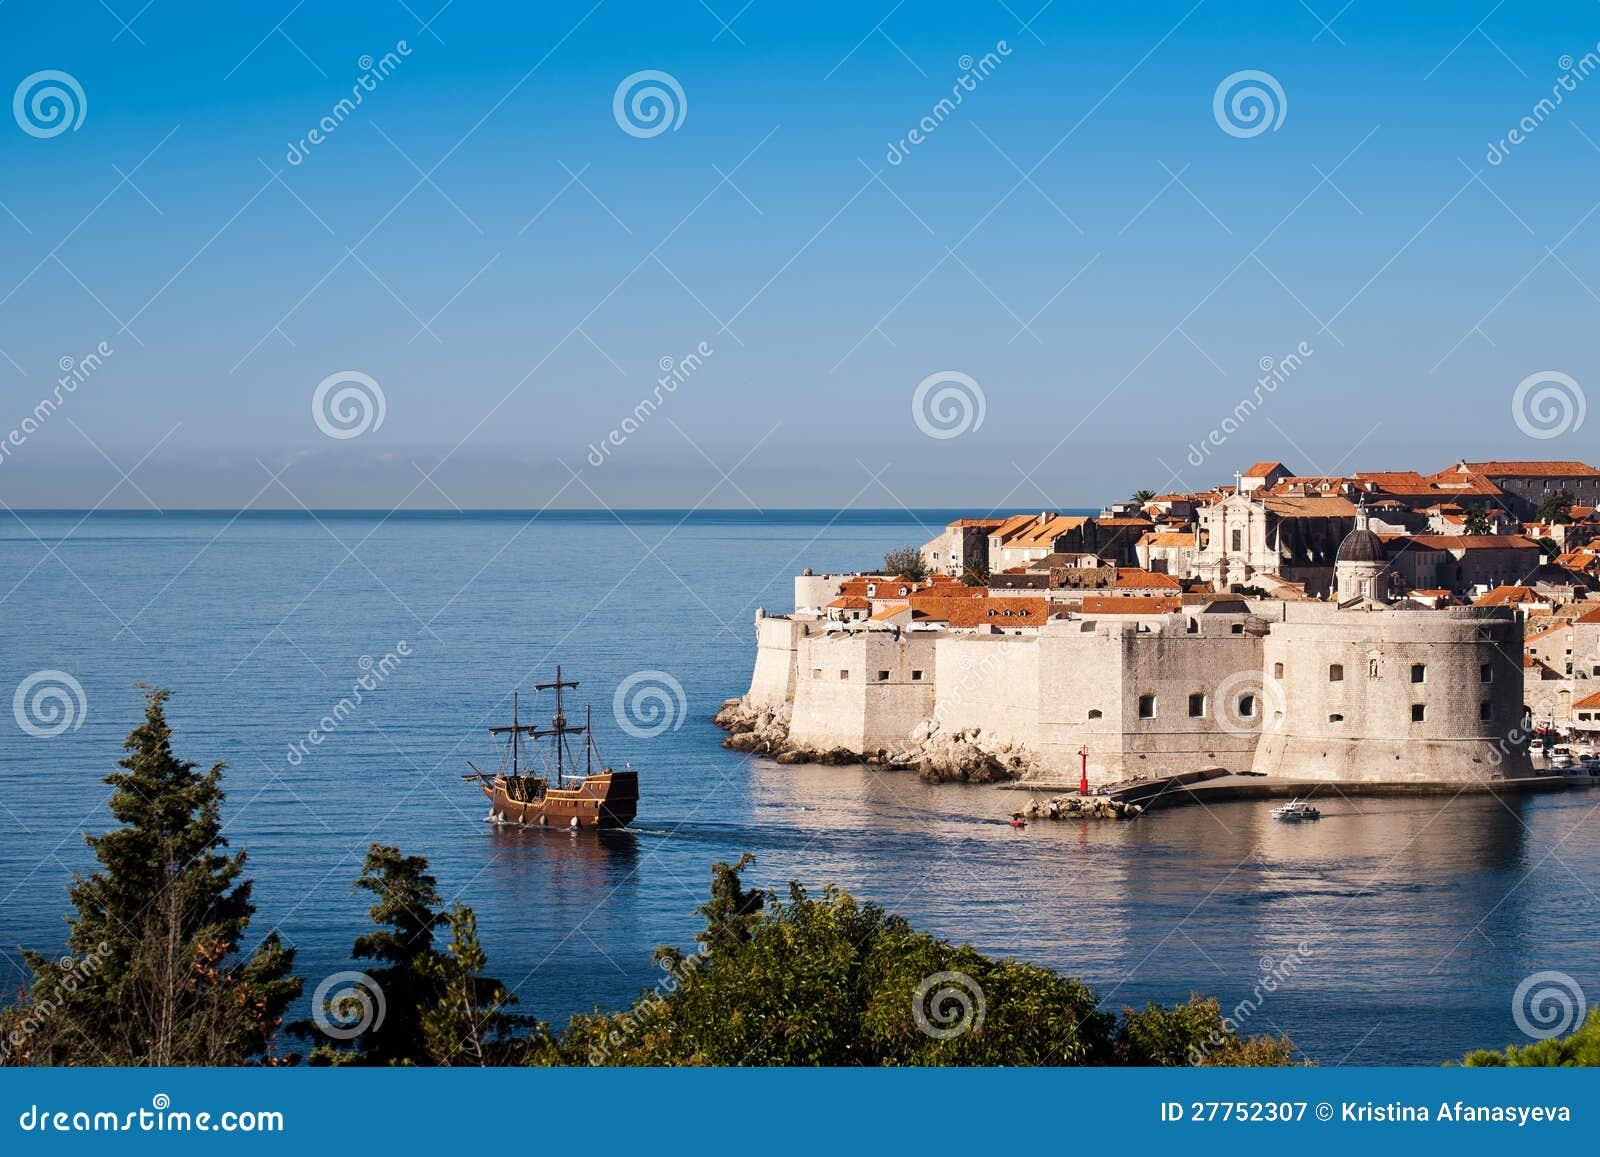 Ville de patrimoine mondial vieille de Dubrovnik